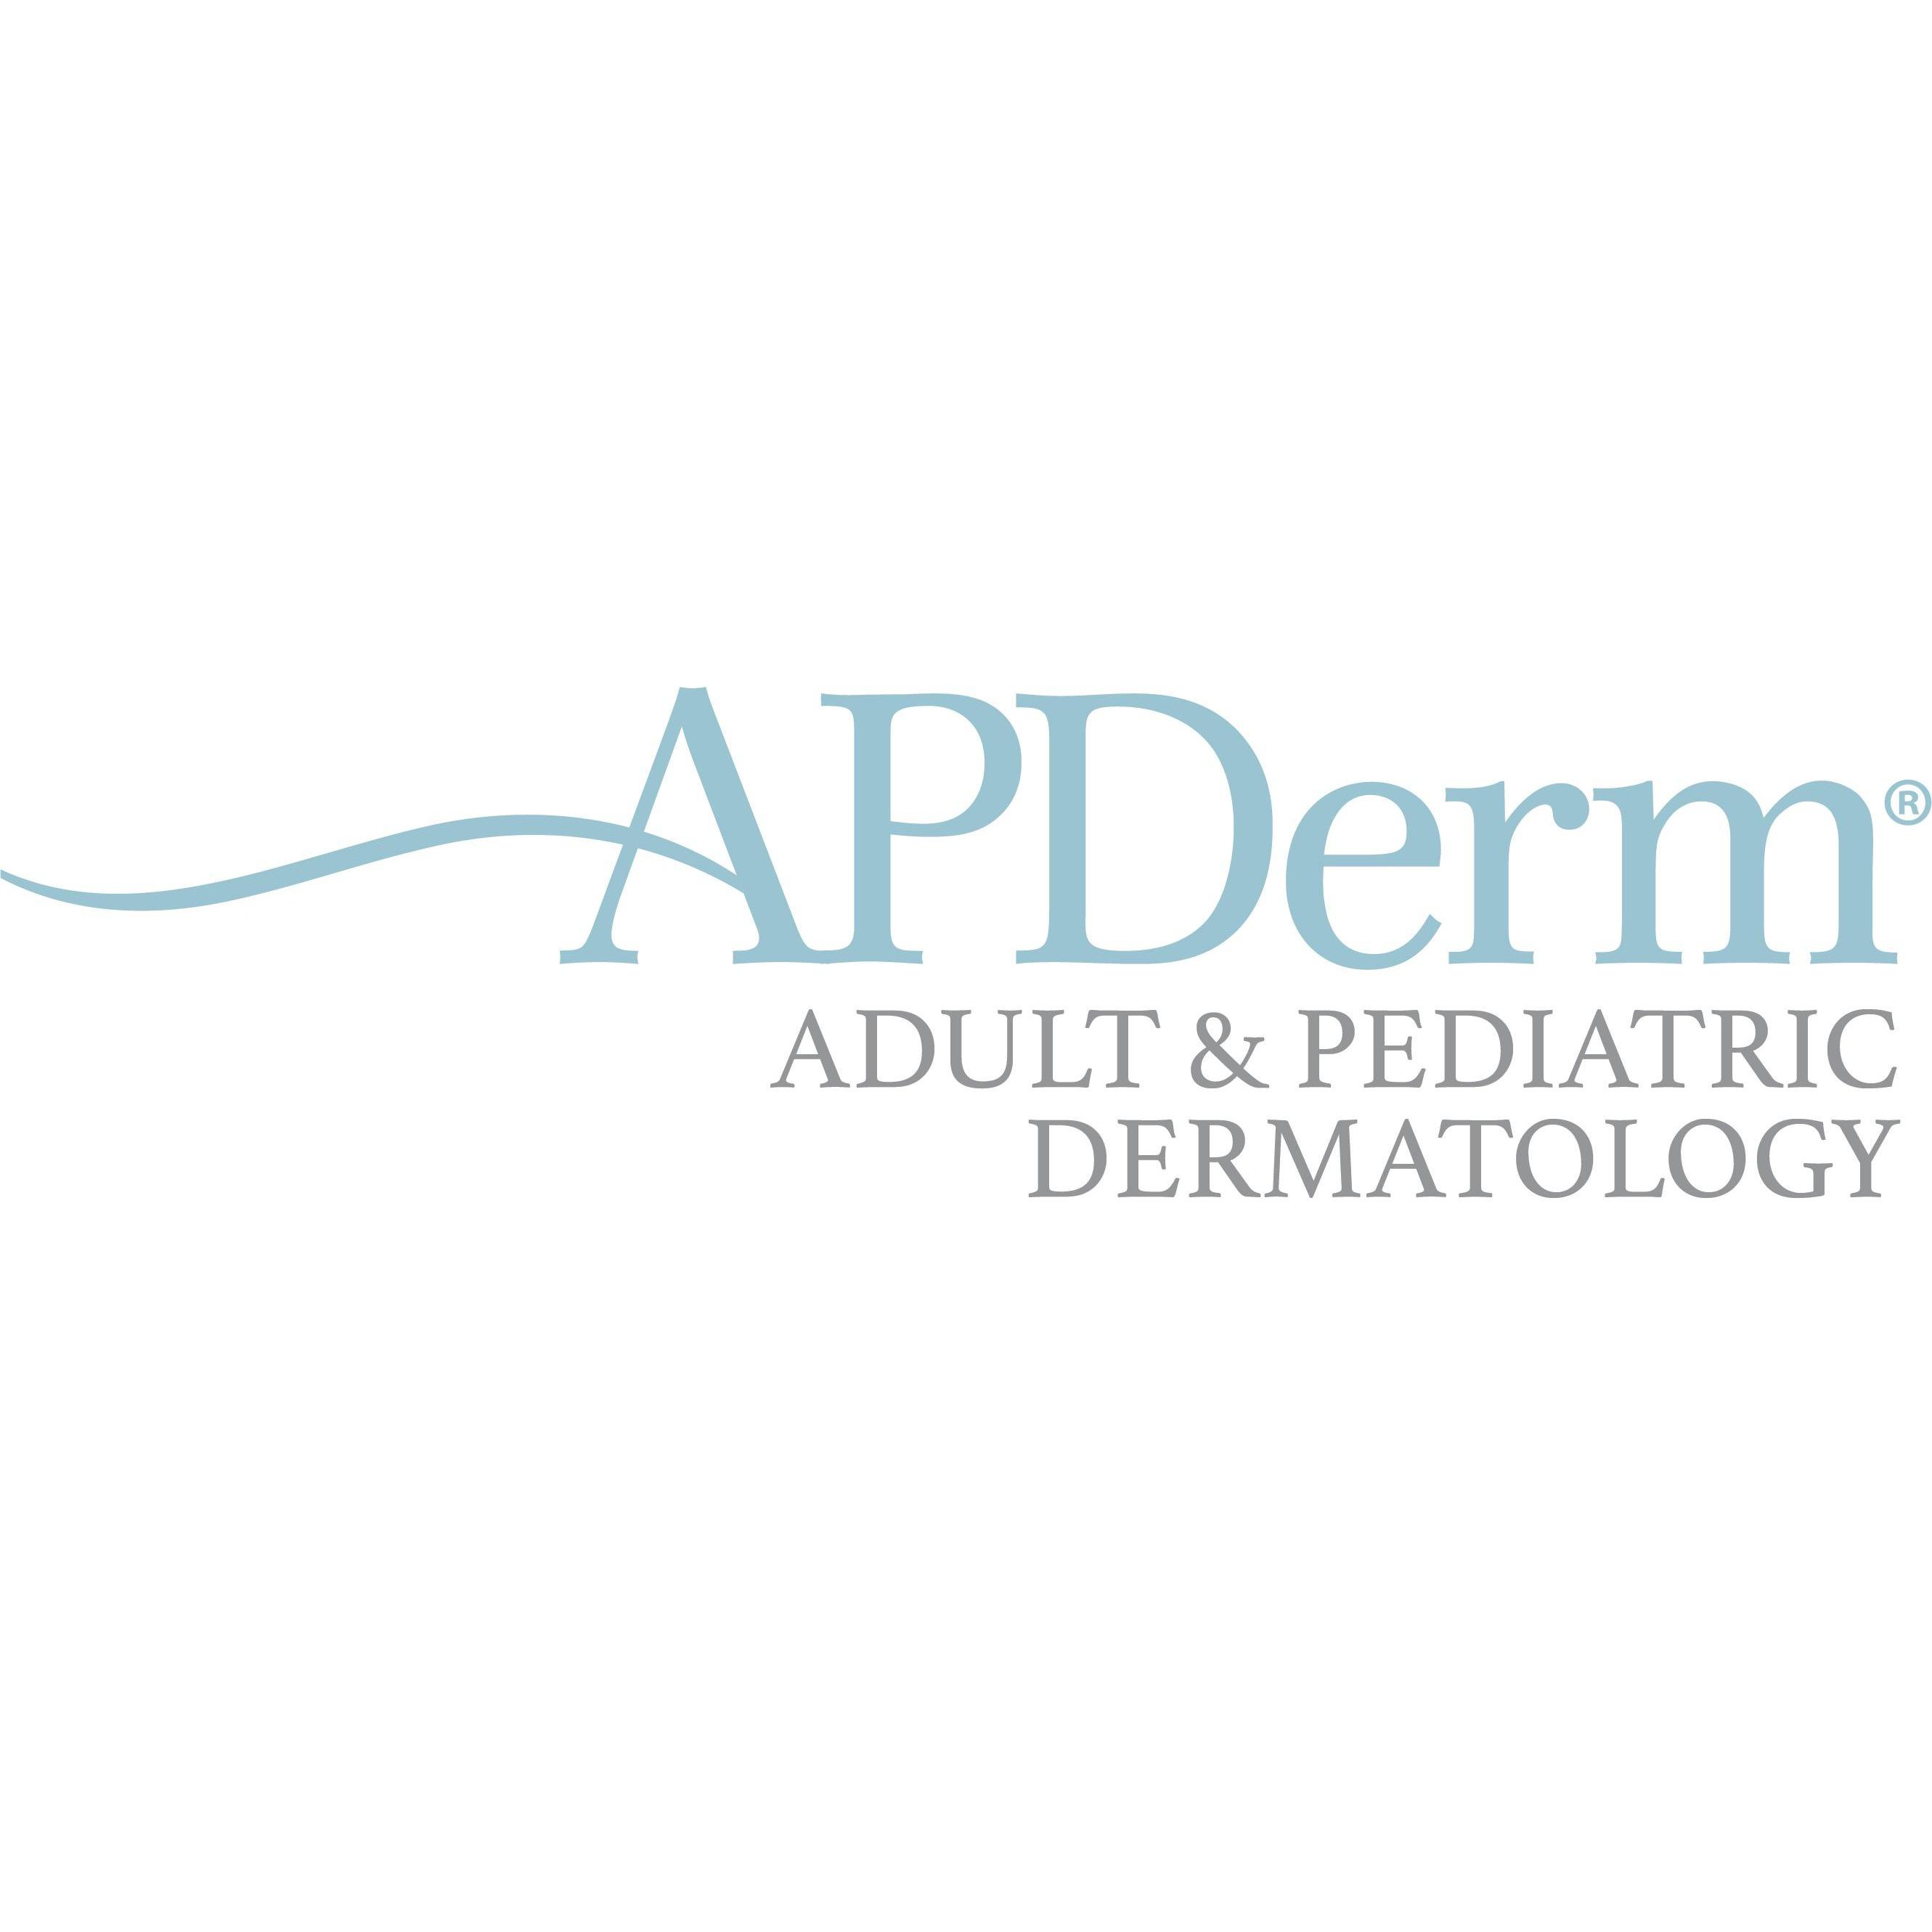 Adult & Pediatric Dermatology, PC